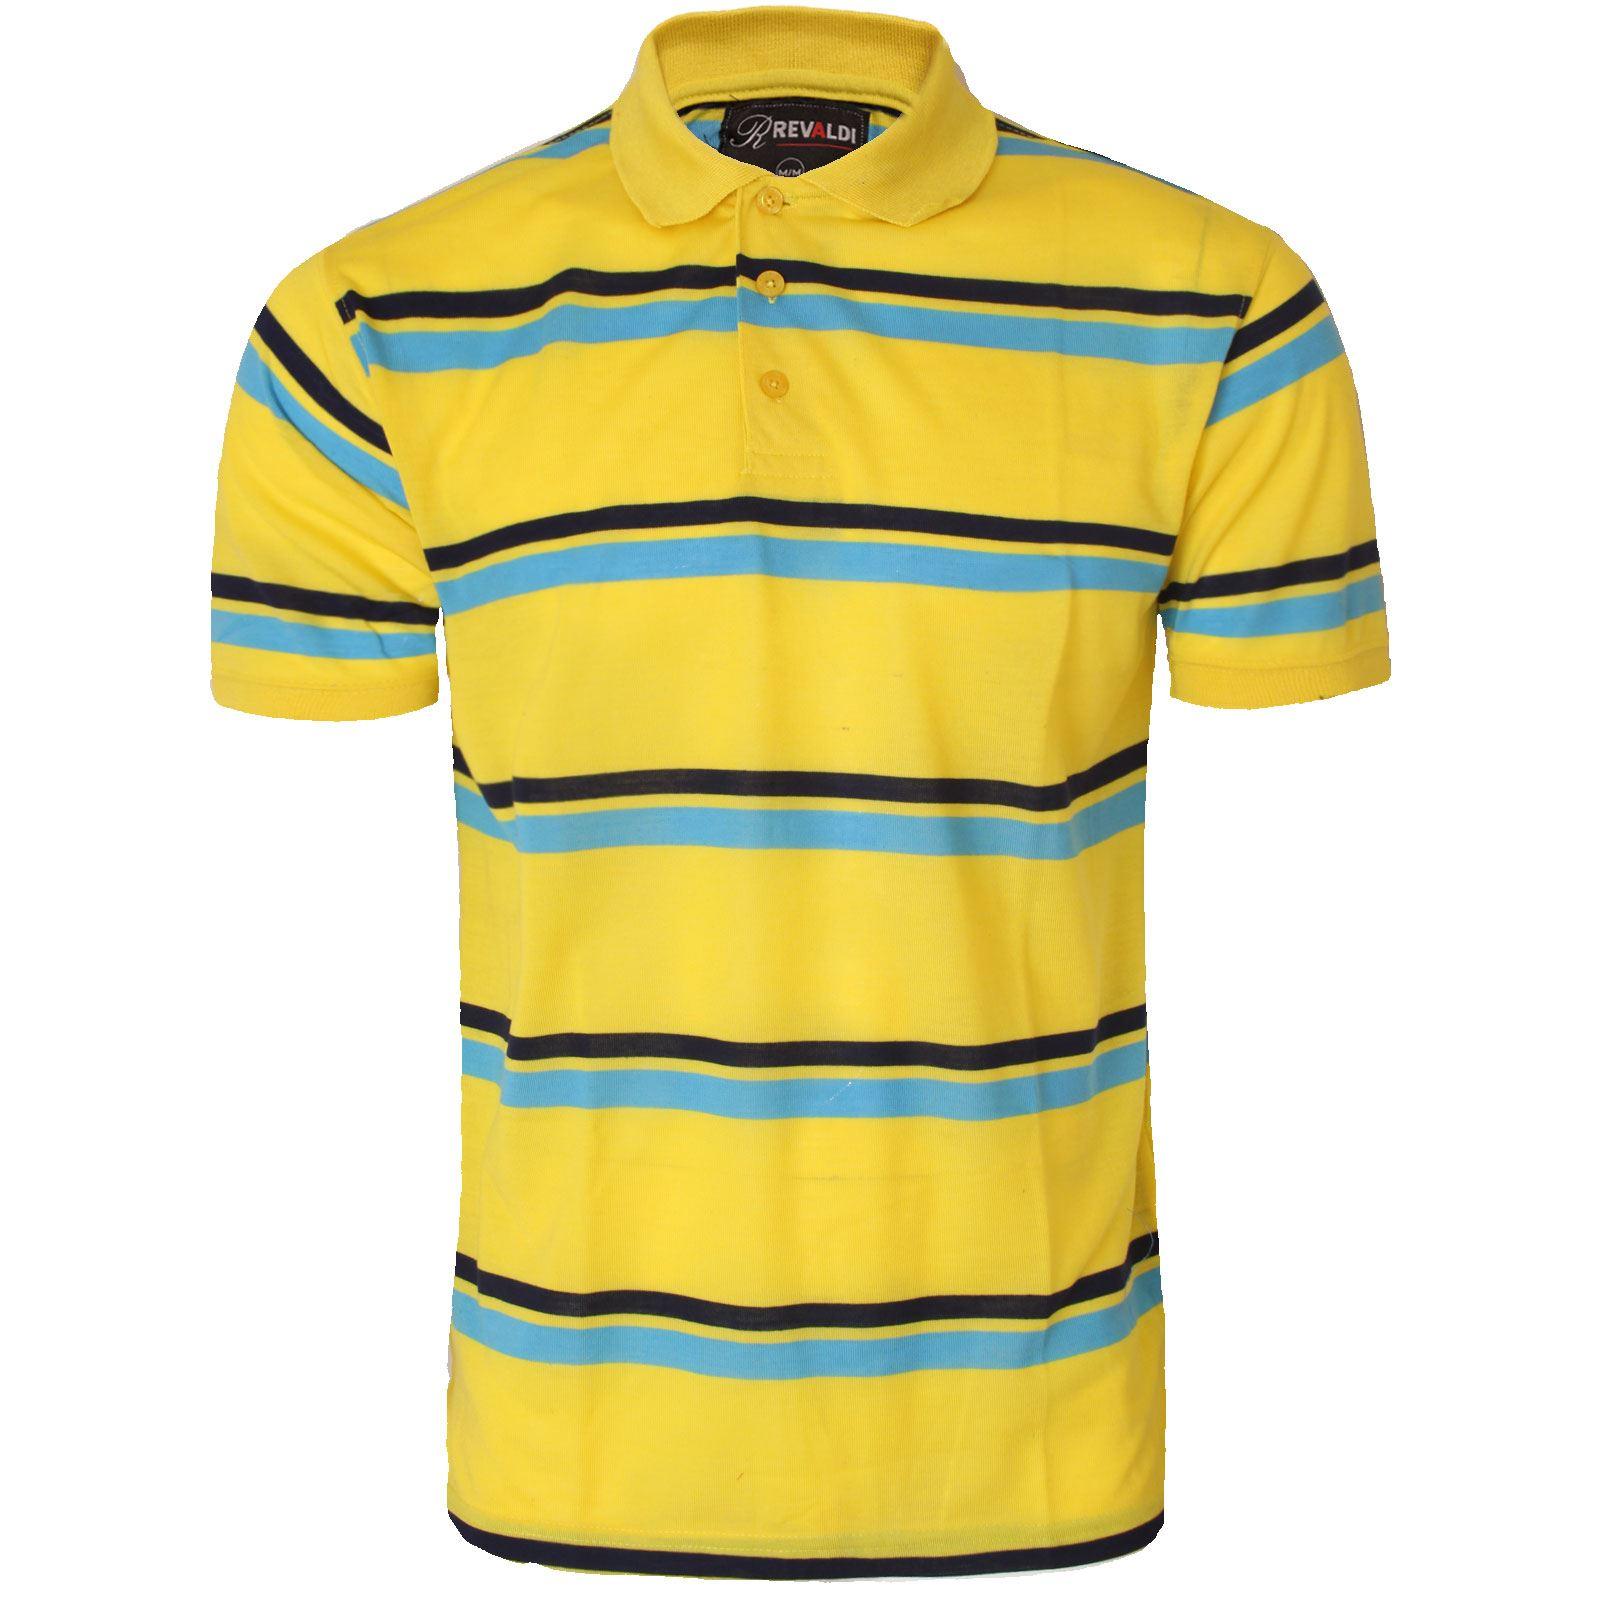 Mens striped short sleeve polo shirt top golf t shirt for Mens short sleeve patterned shirts